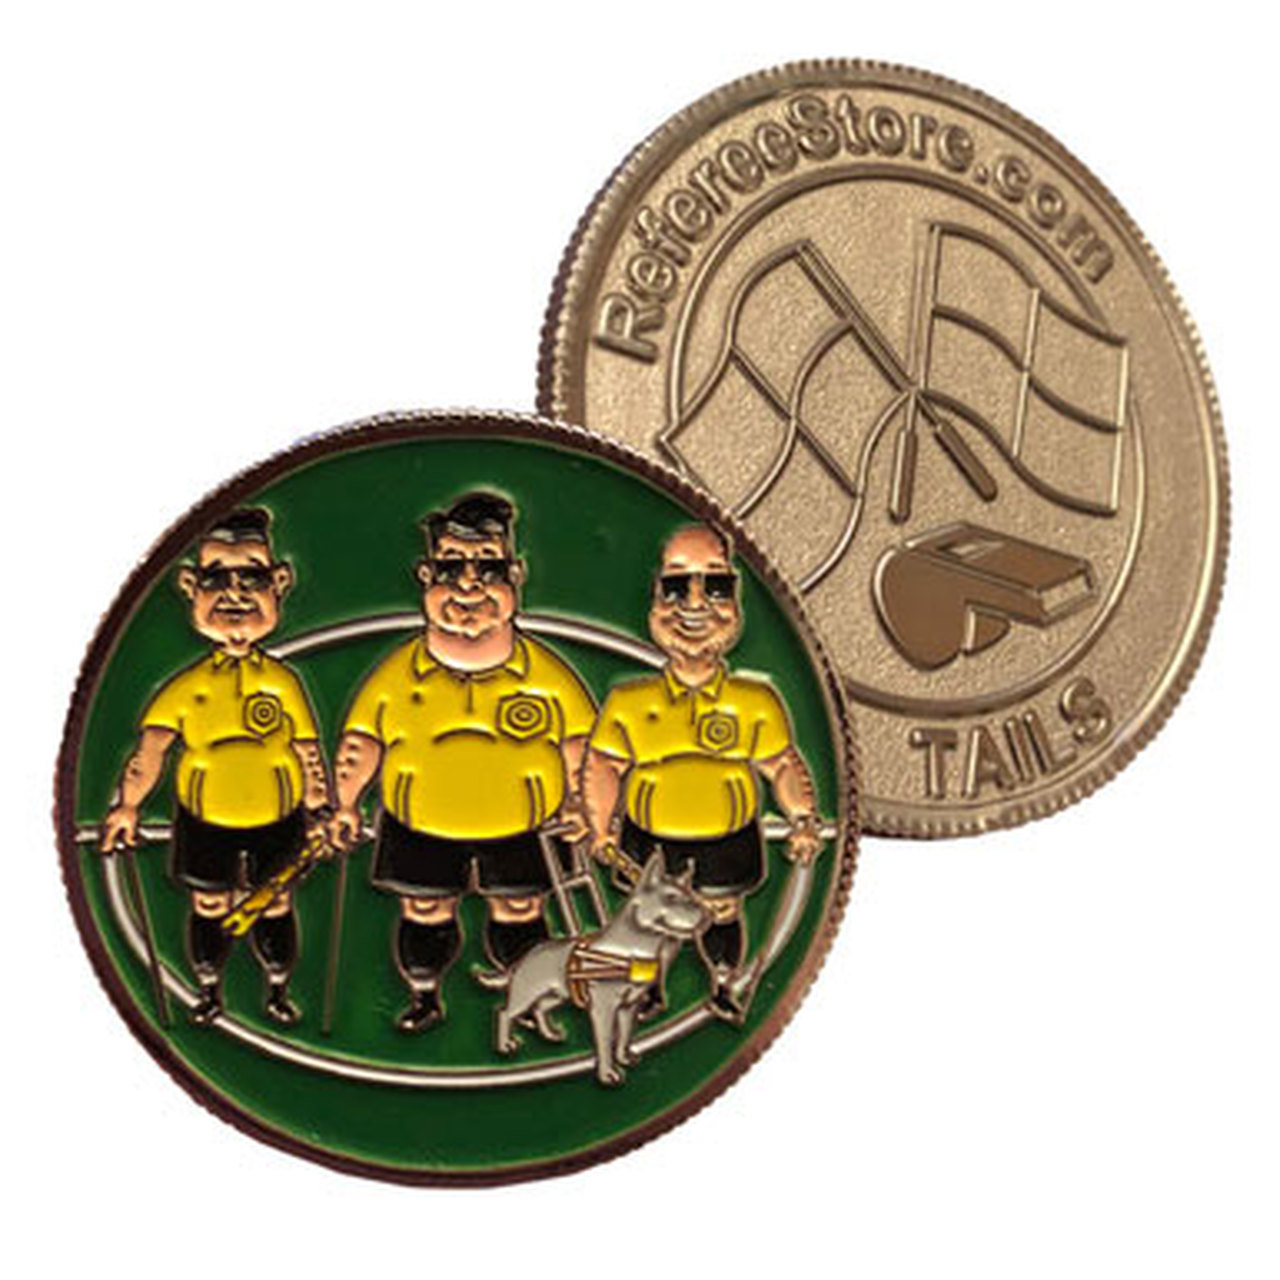 Blind_Referees__37092.1557428422.385__92182.1561966285.jpg